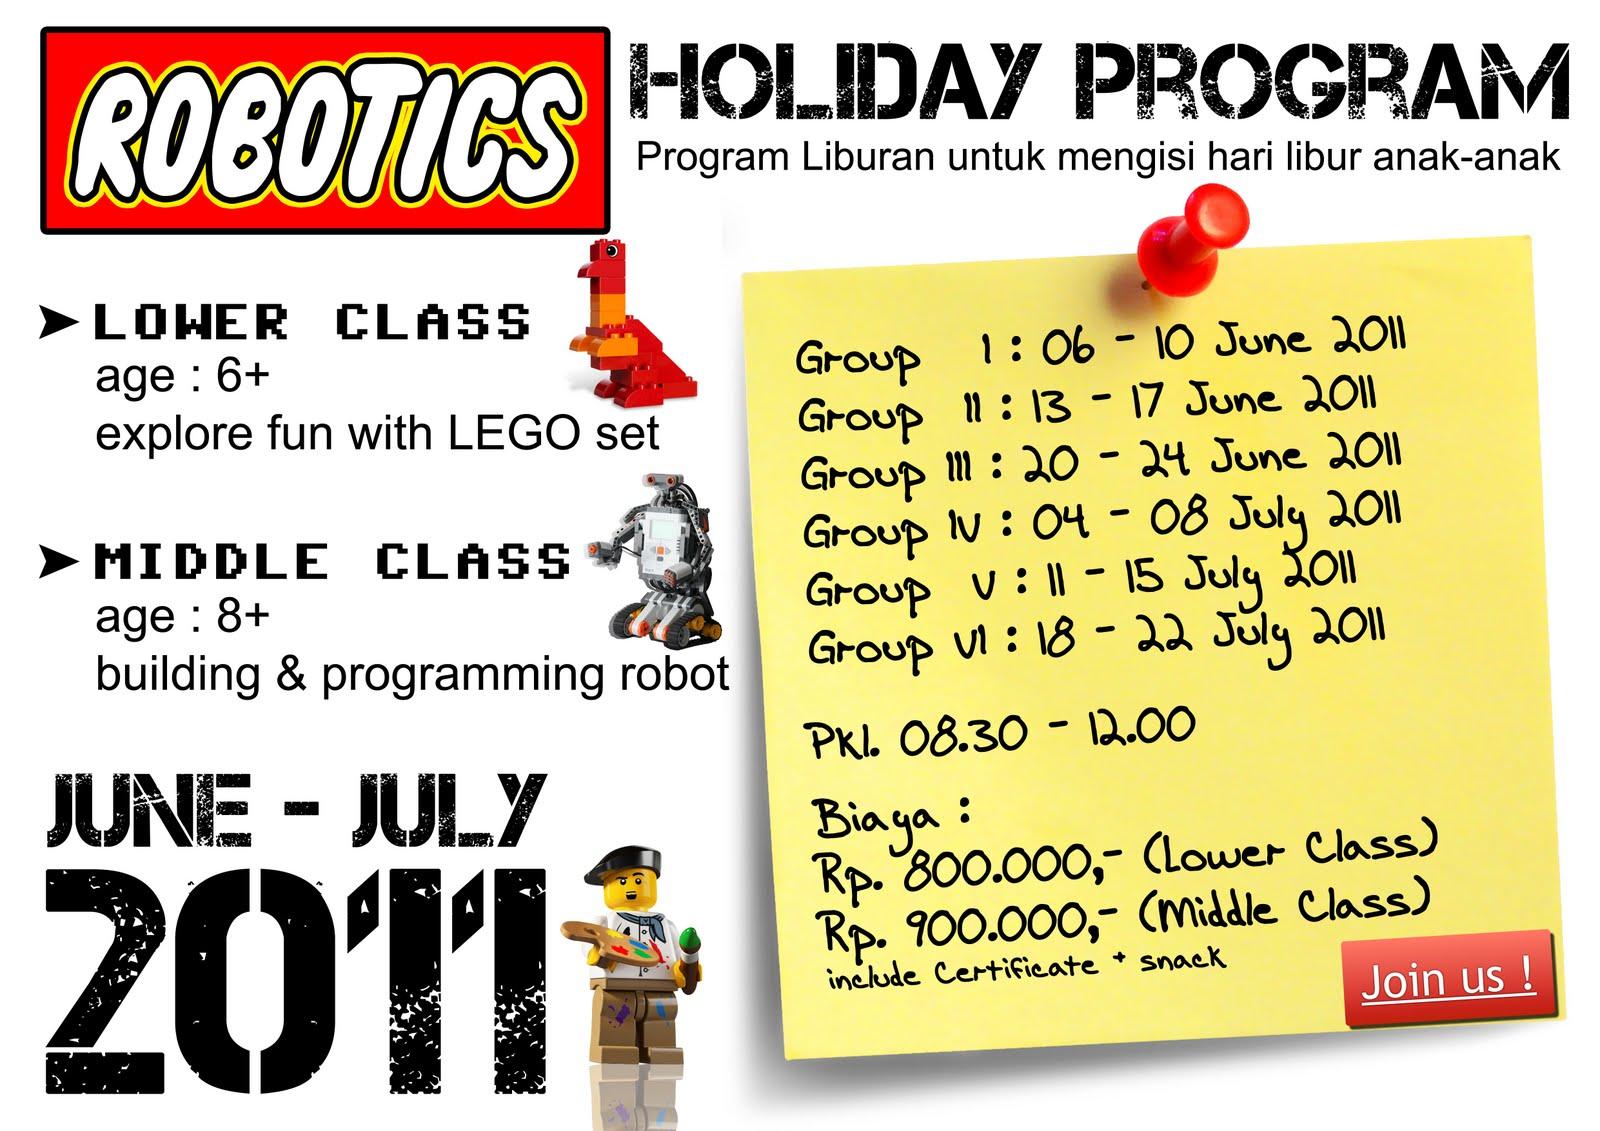 Robotics Education Centre Holiday Program With Robotics Education